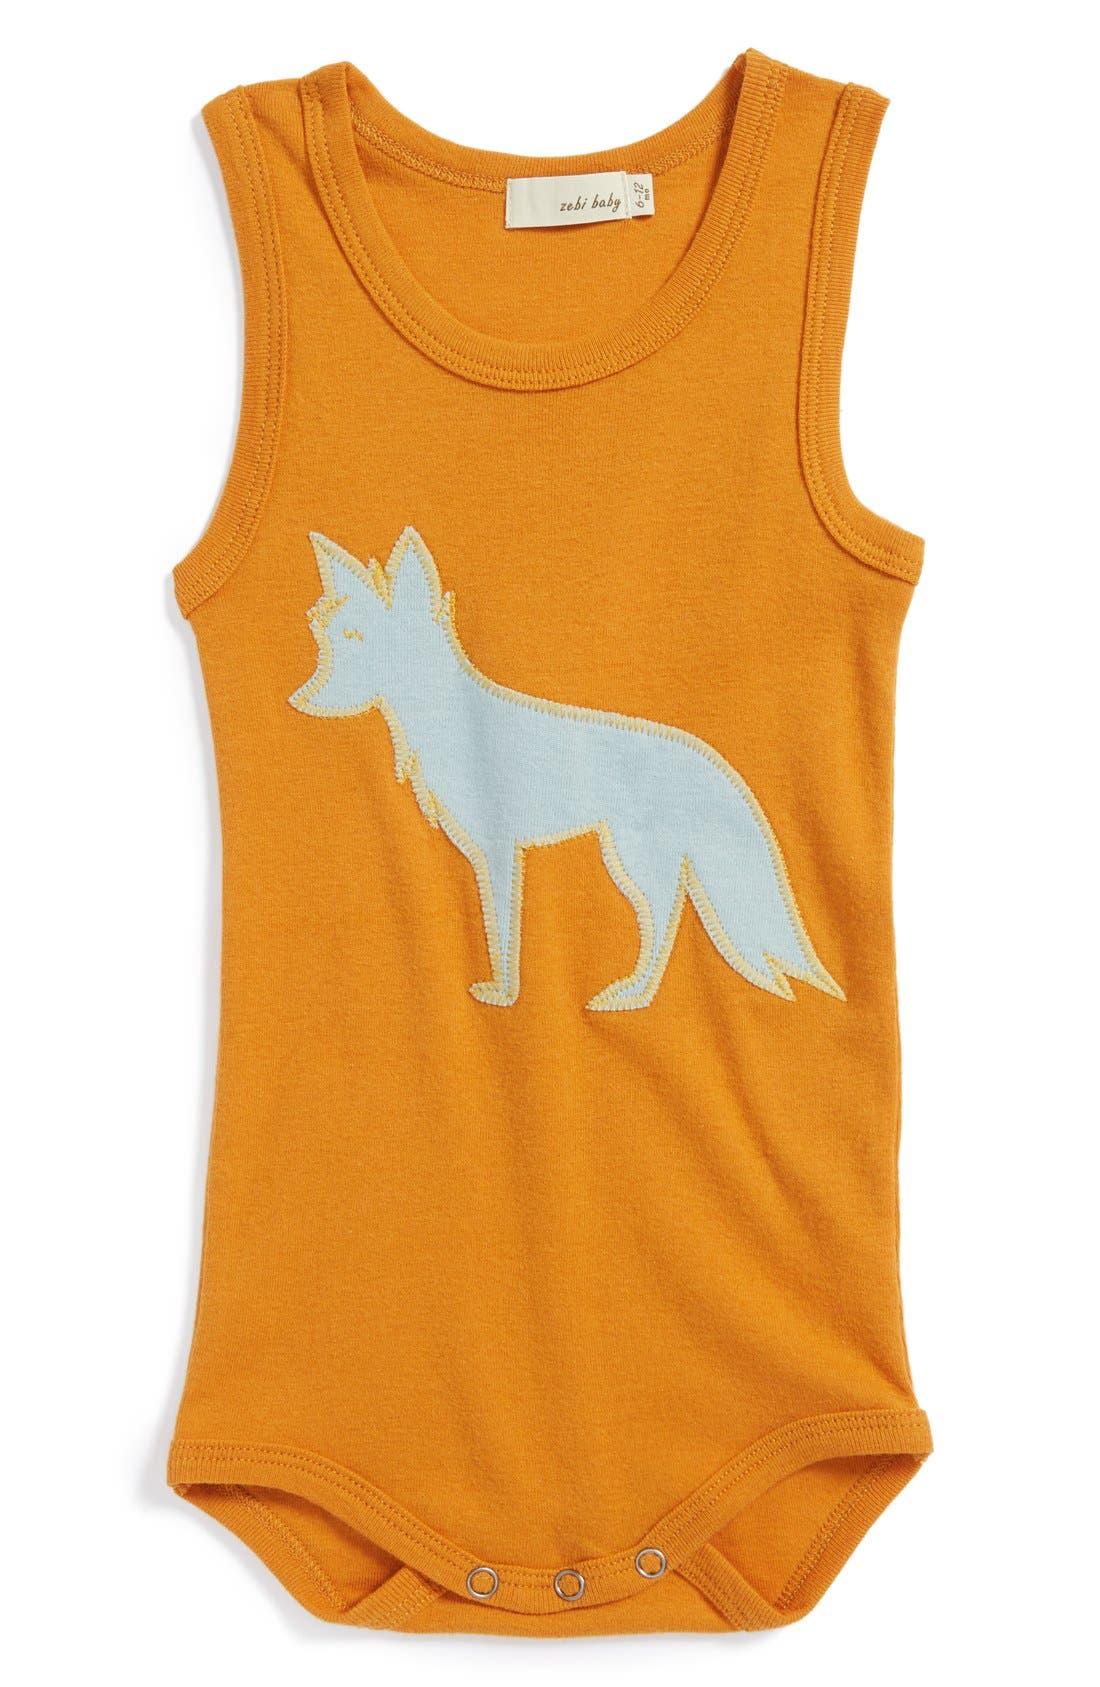 Zebi Baby 'Fox' Organic Cotton Bodysuit, Main, color, 800